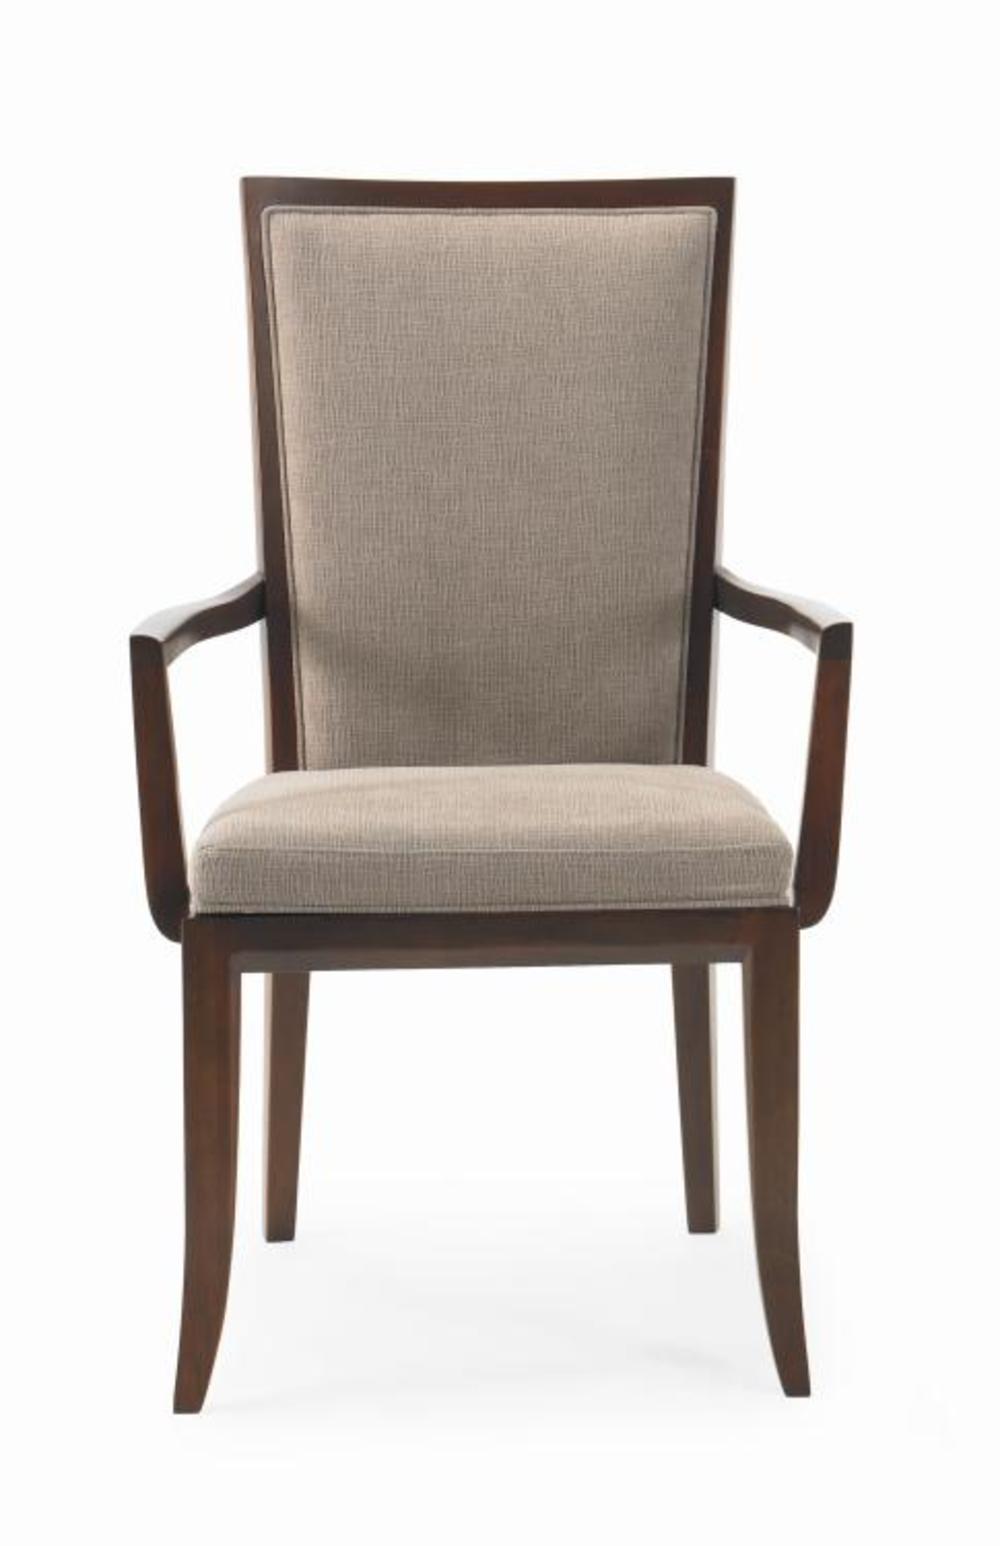 Century Furniture - Paragon Club Luna Park Arm Chair